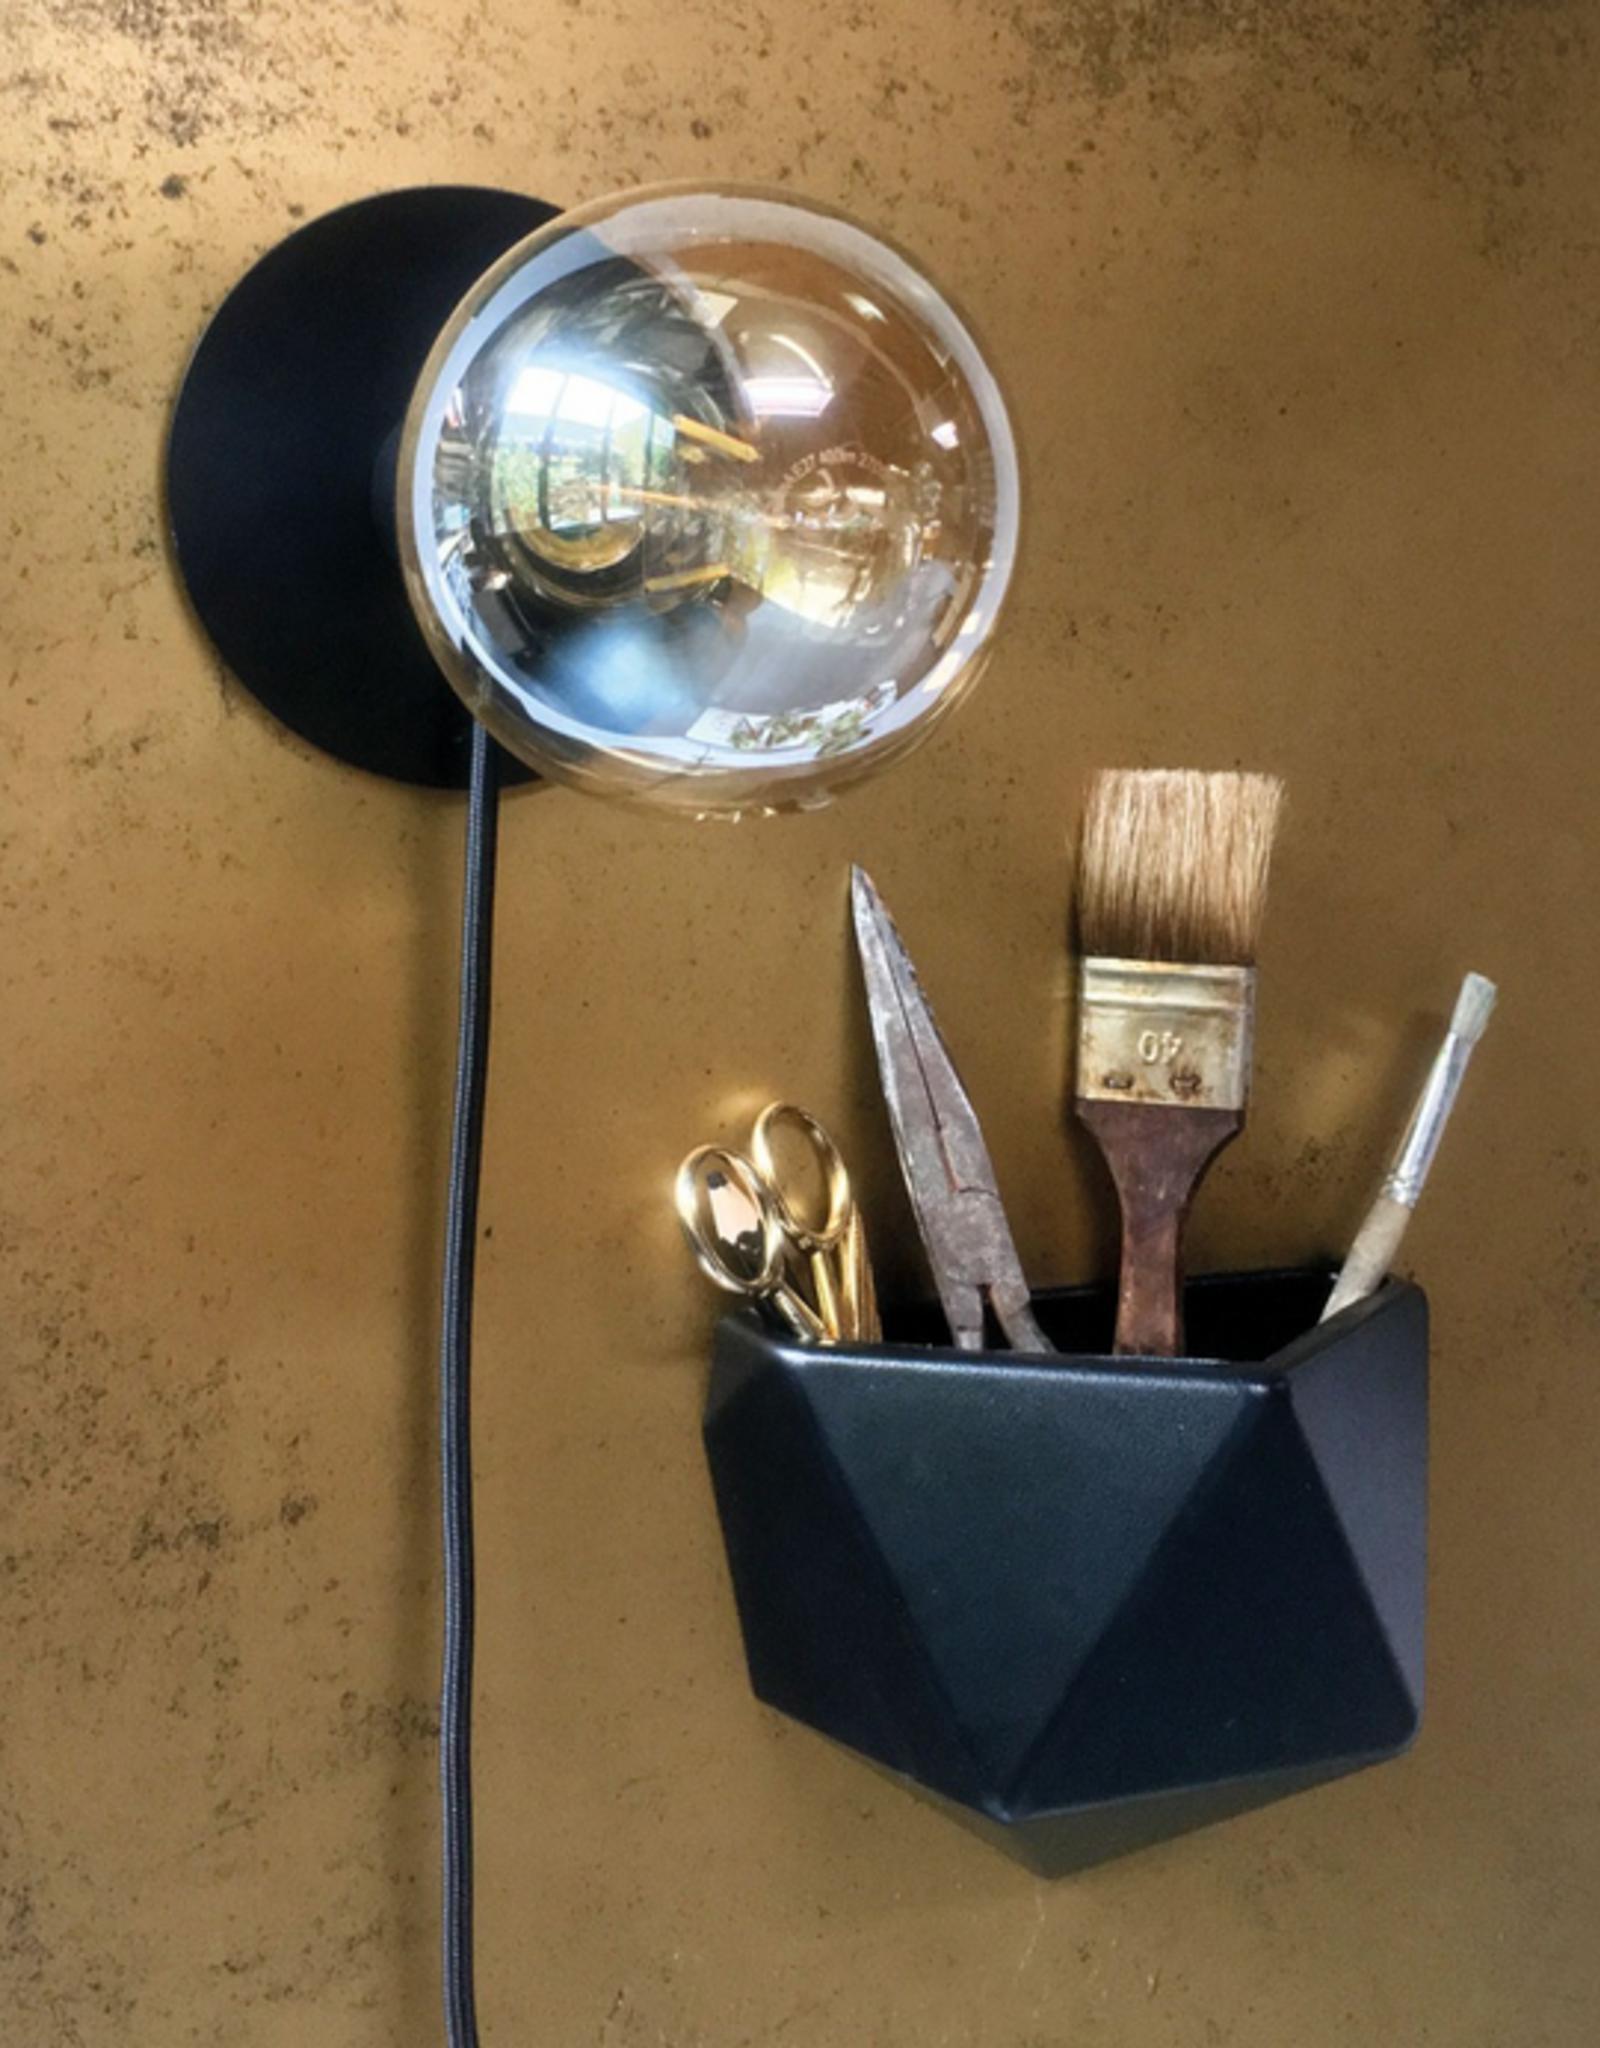 Groovy Magnets Groovy Magnets - Magneetsticker- ovaal vintage/goud